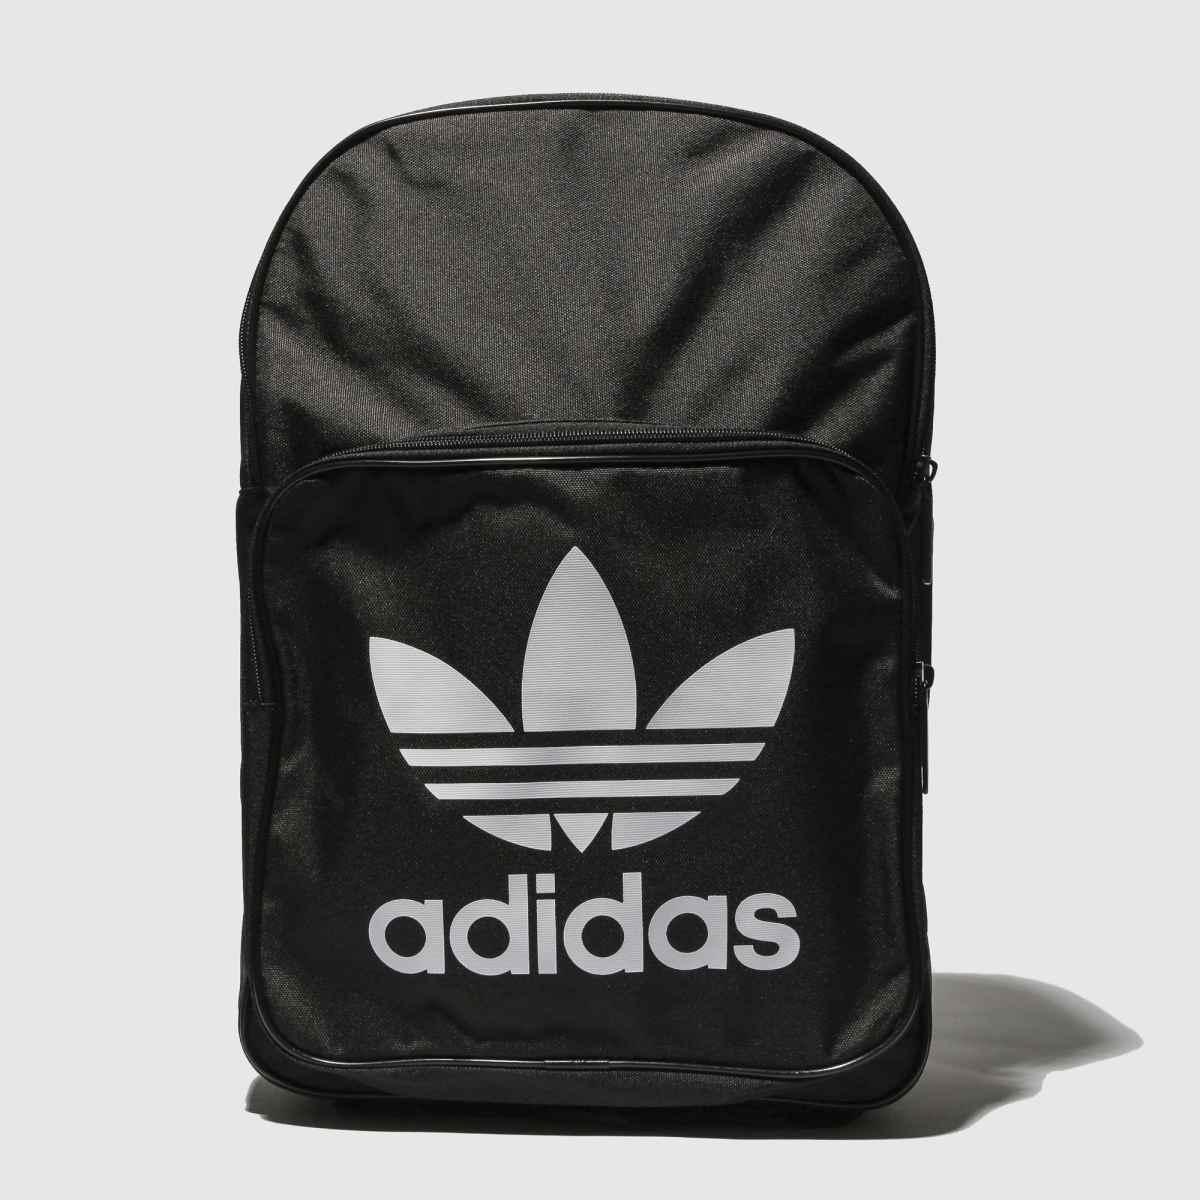 Image of Adidas Black Classic Trefoil